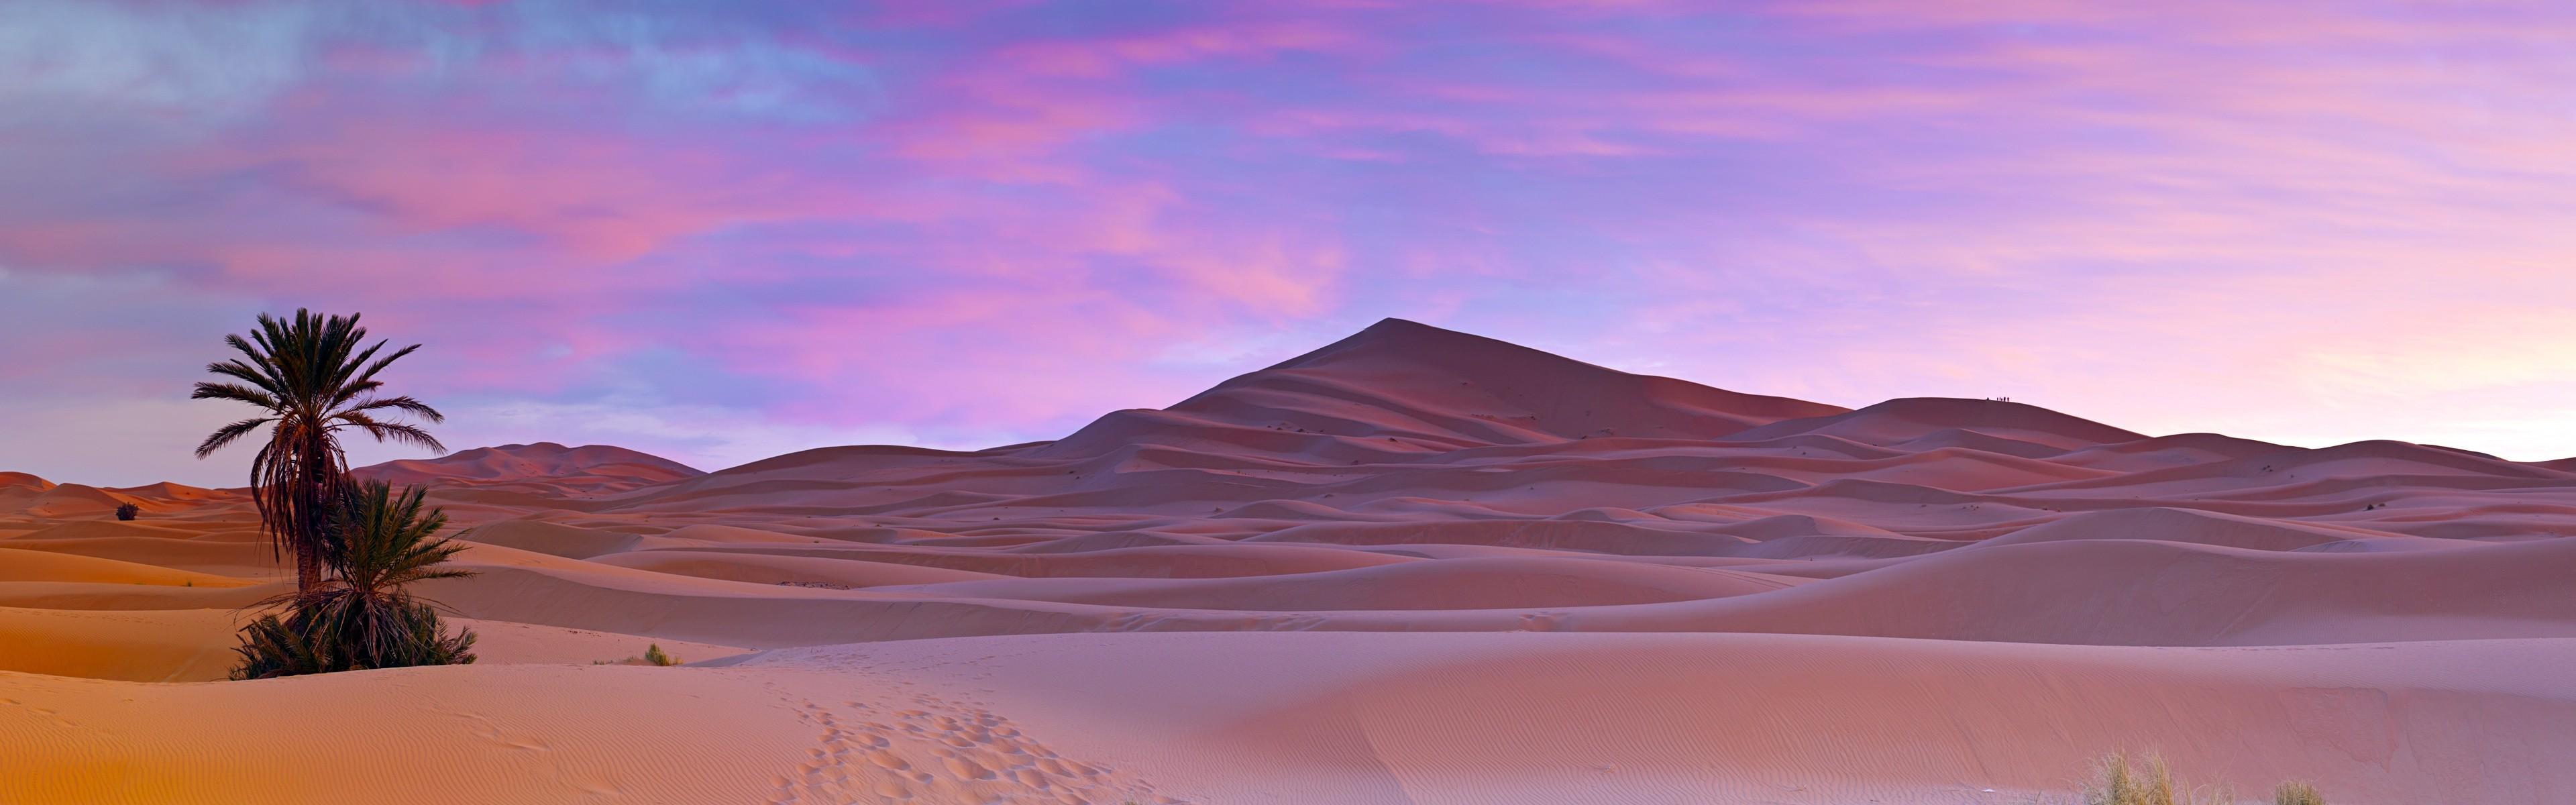 Res: 3840x1200, Palm trees Sahara Desert Morocco Wallpapers